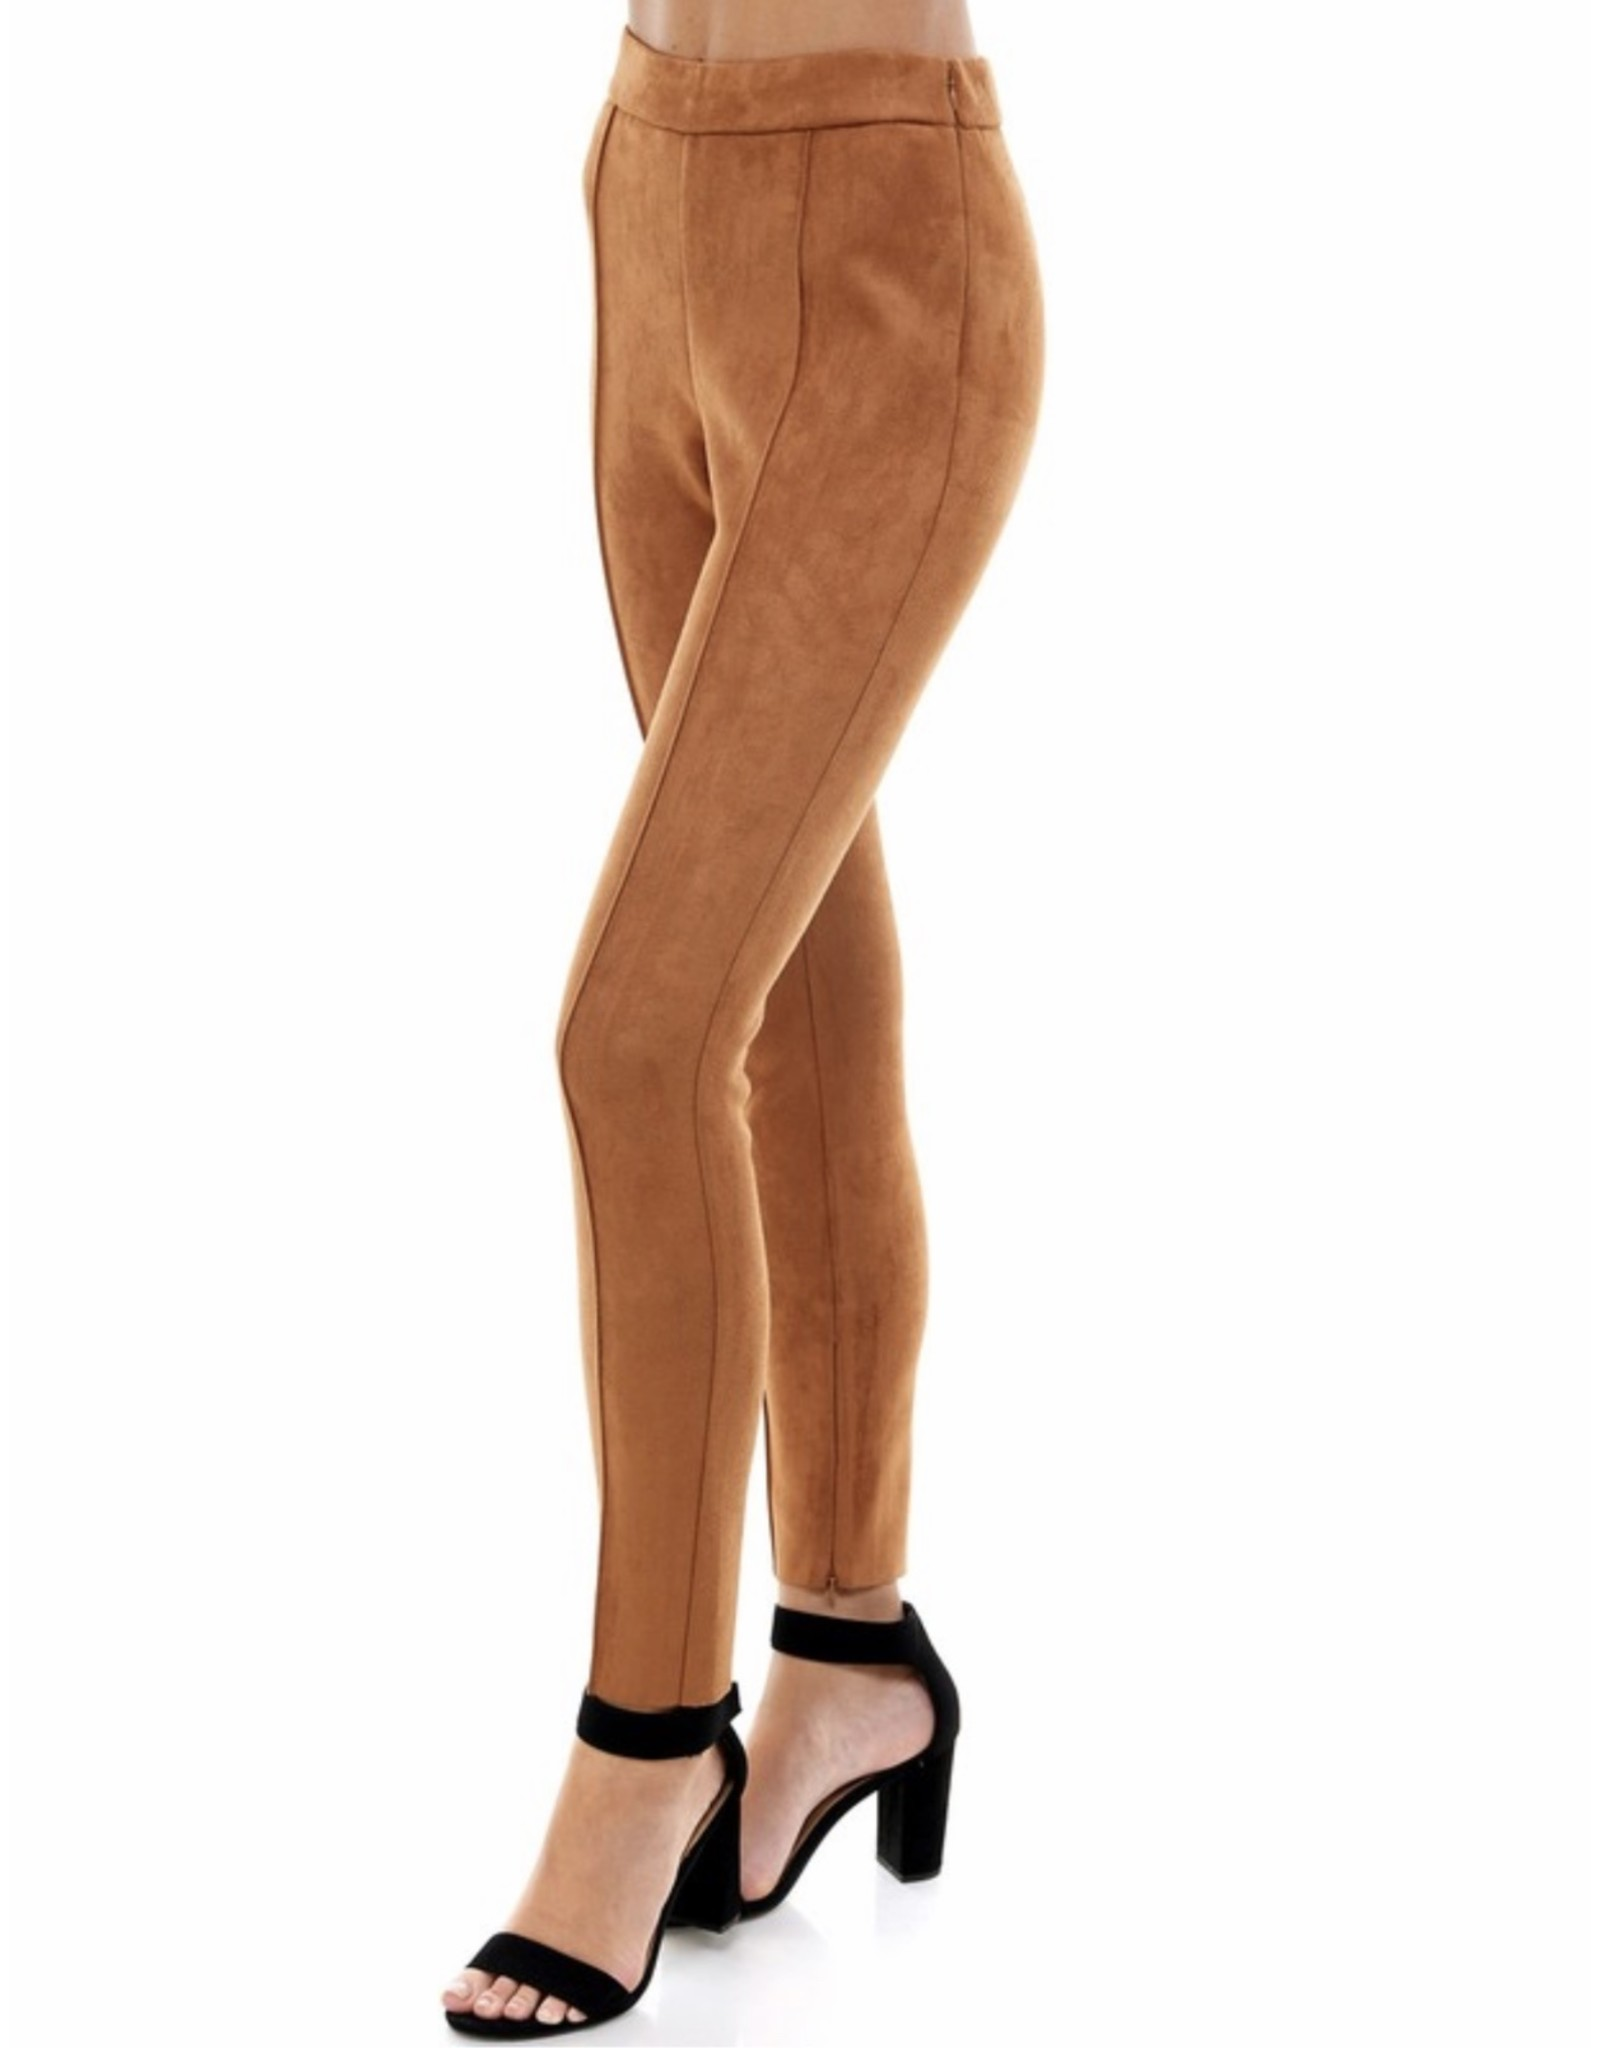 Suede Pants - Camel